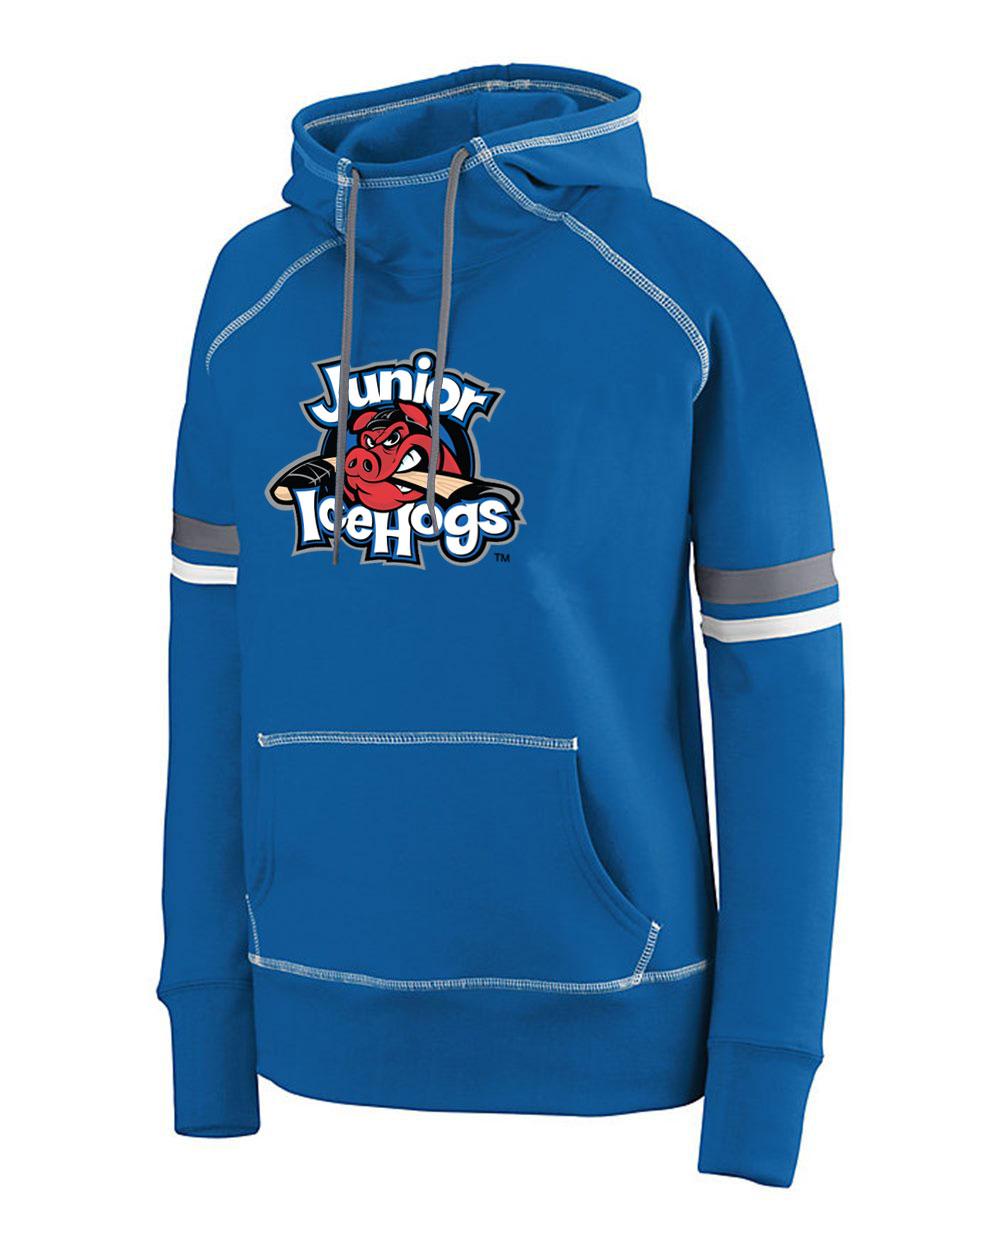 Augusta_Sportswear_5440_Royal__White__Graphite_Side_High